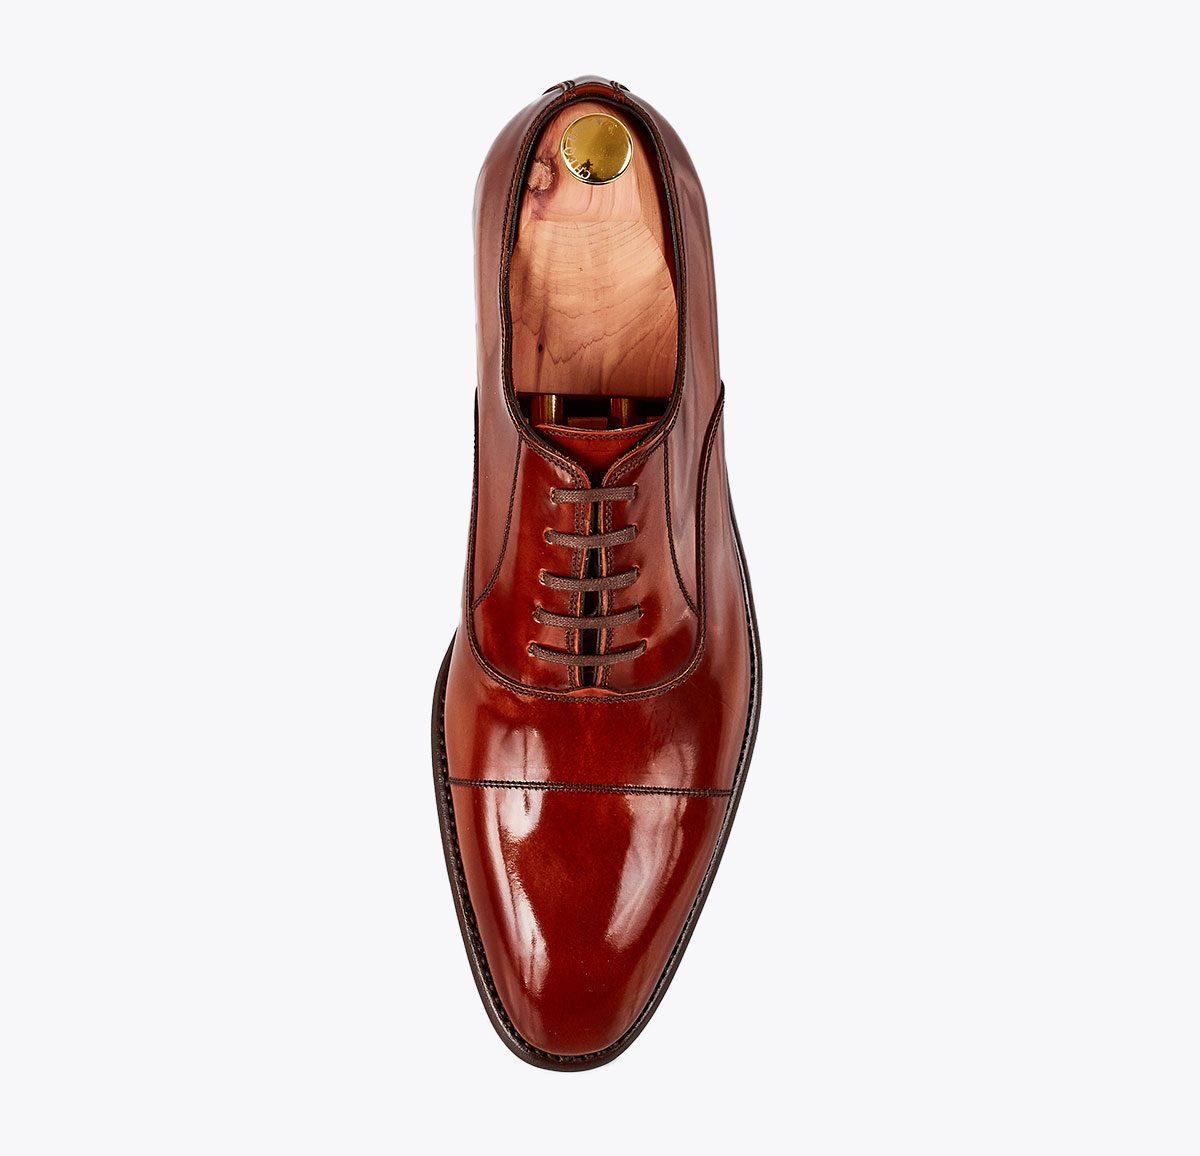 Zapato clásico chesnut hecho a mano en mandalashoes, Santanyí Mallorca. Hand made shoes. Nach Mass Schuhe